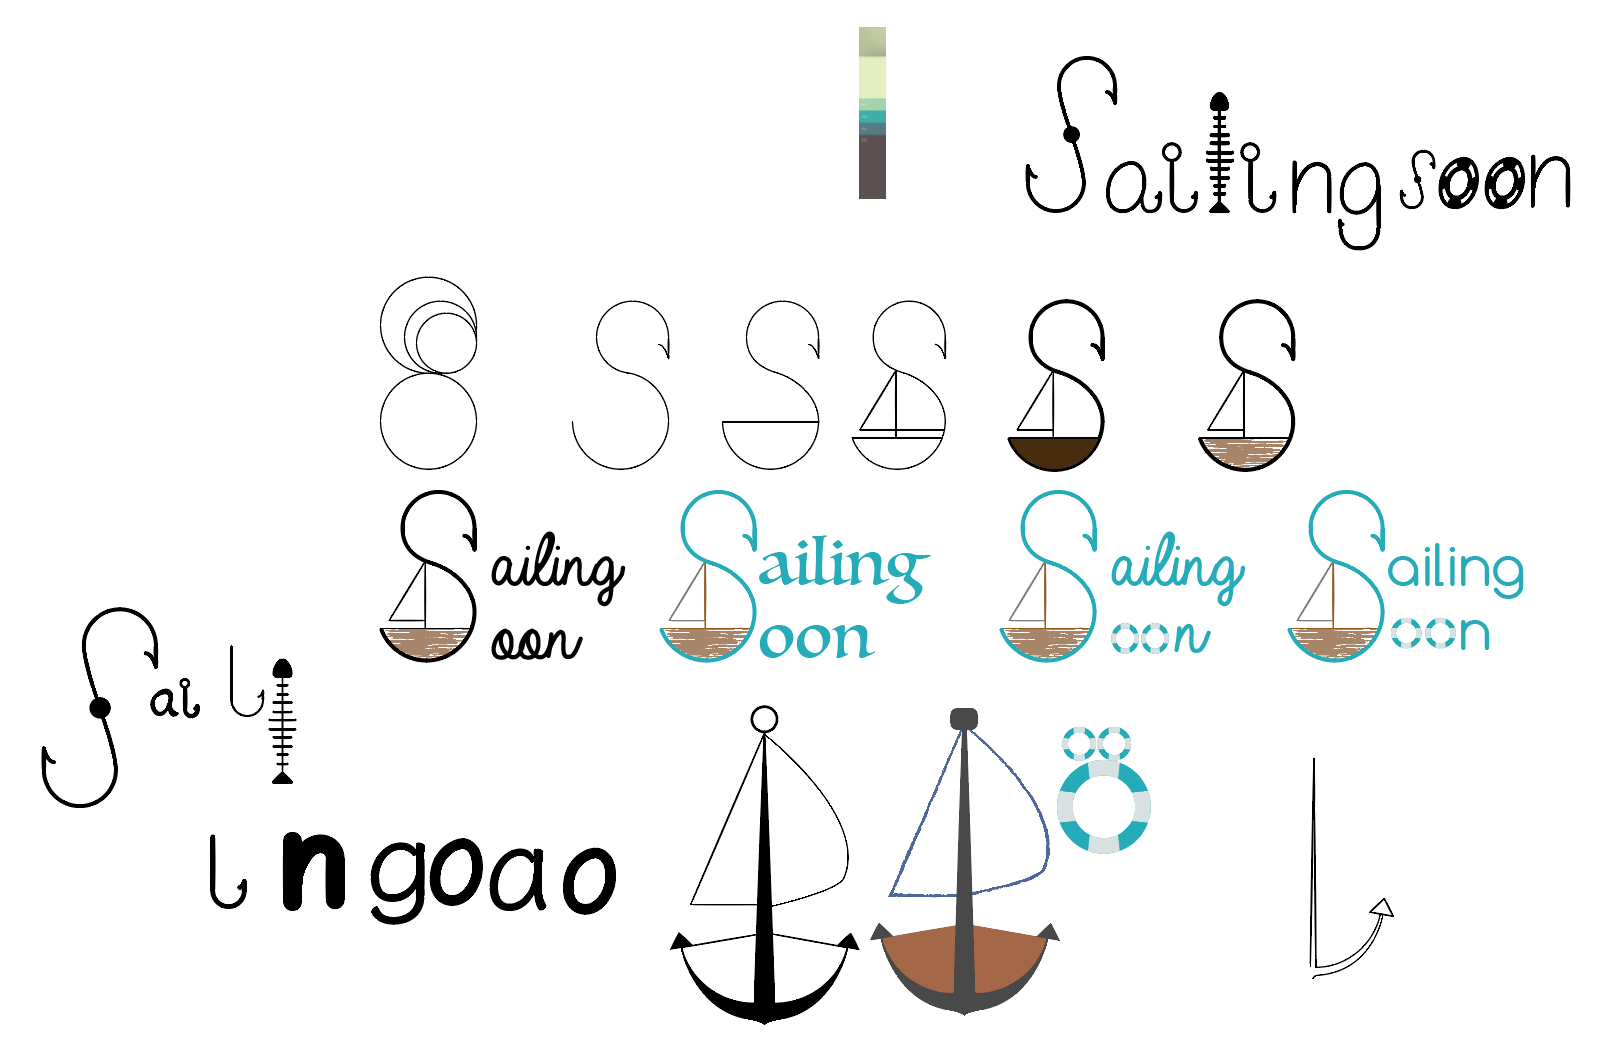 logos_sailing_soon_1stdraft